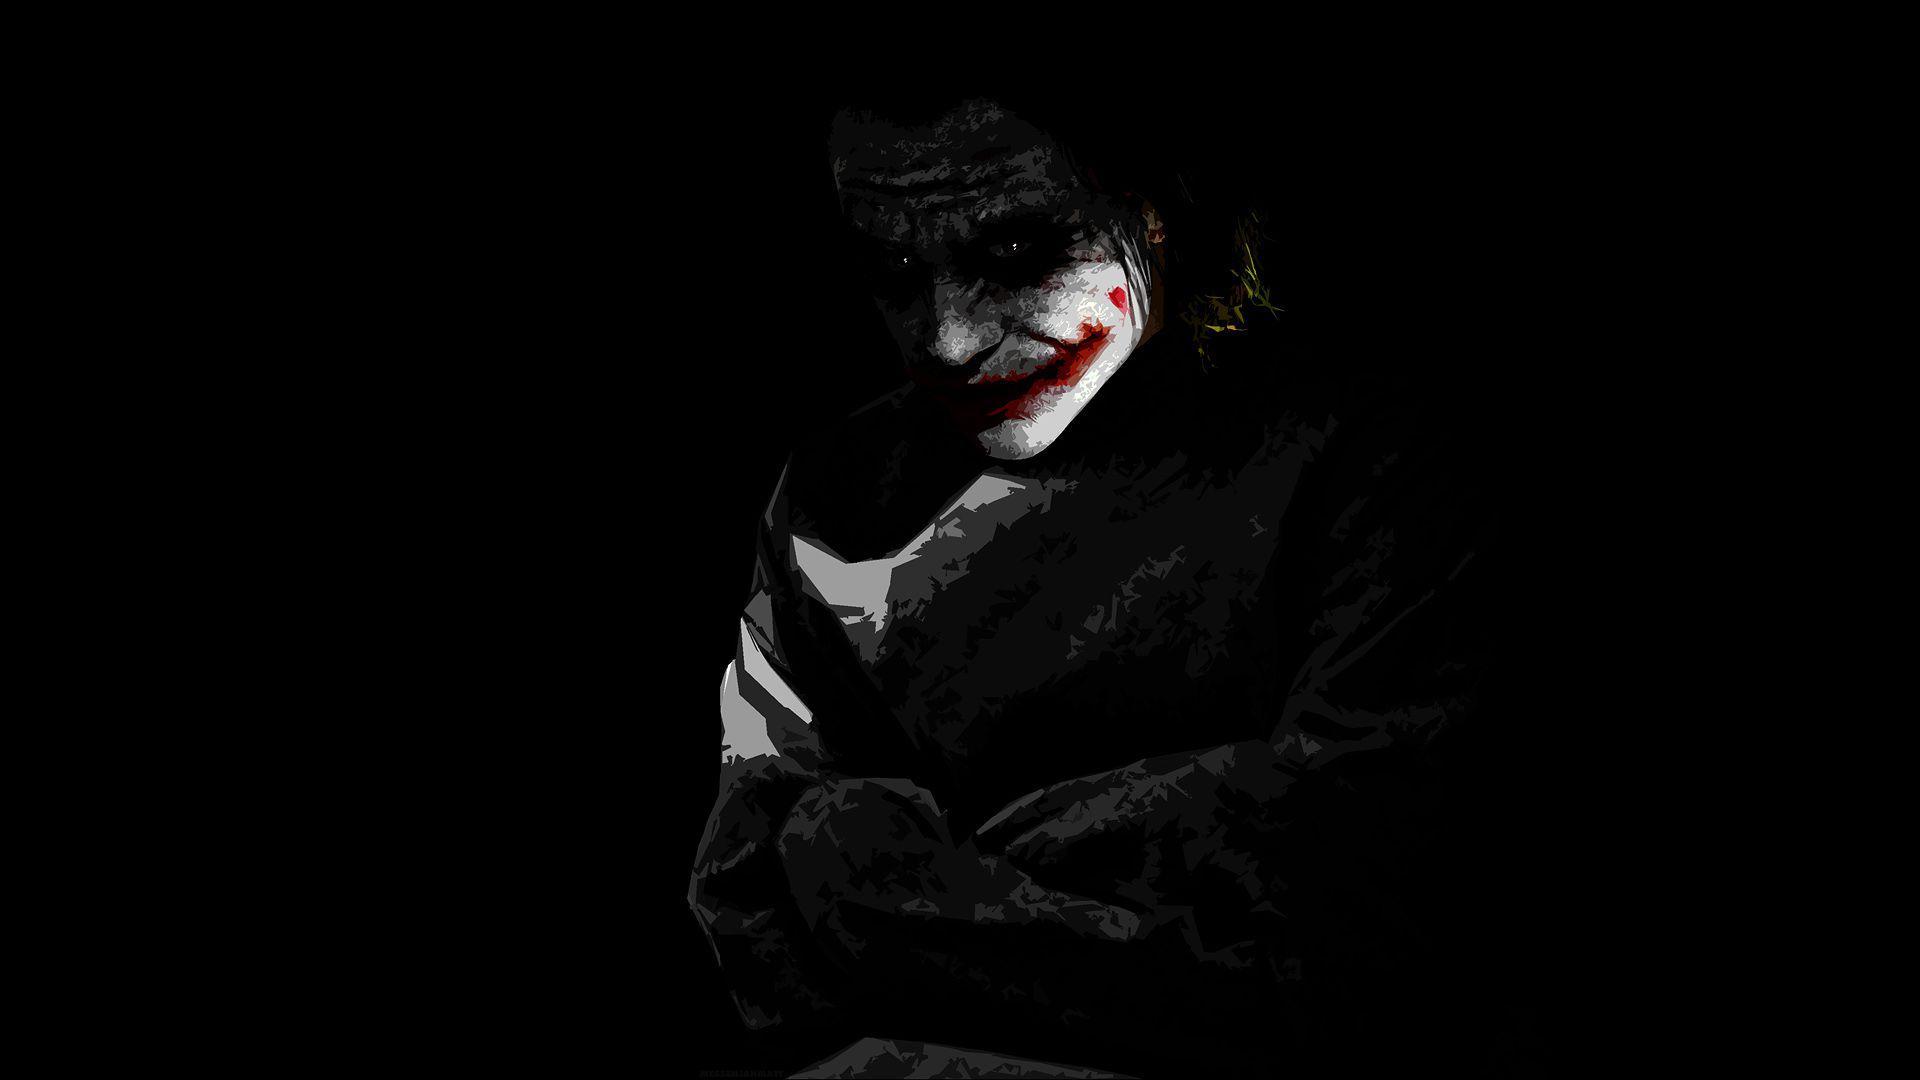 Joker HD wallpapers for iphone48